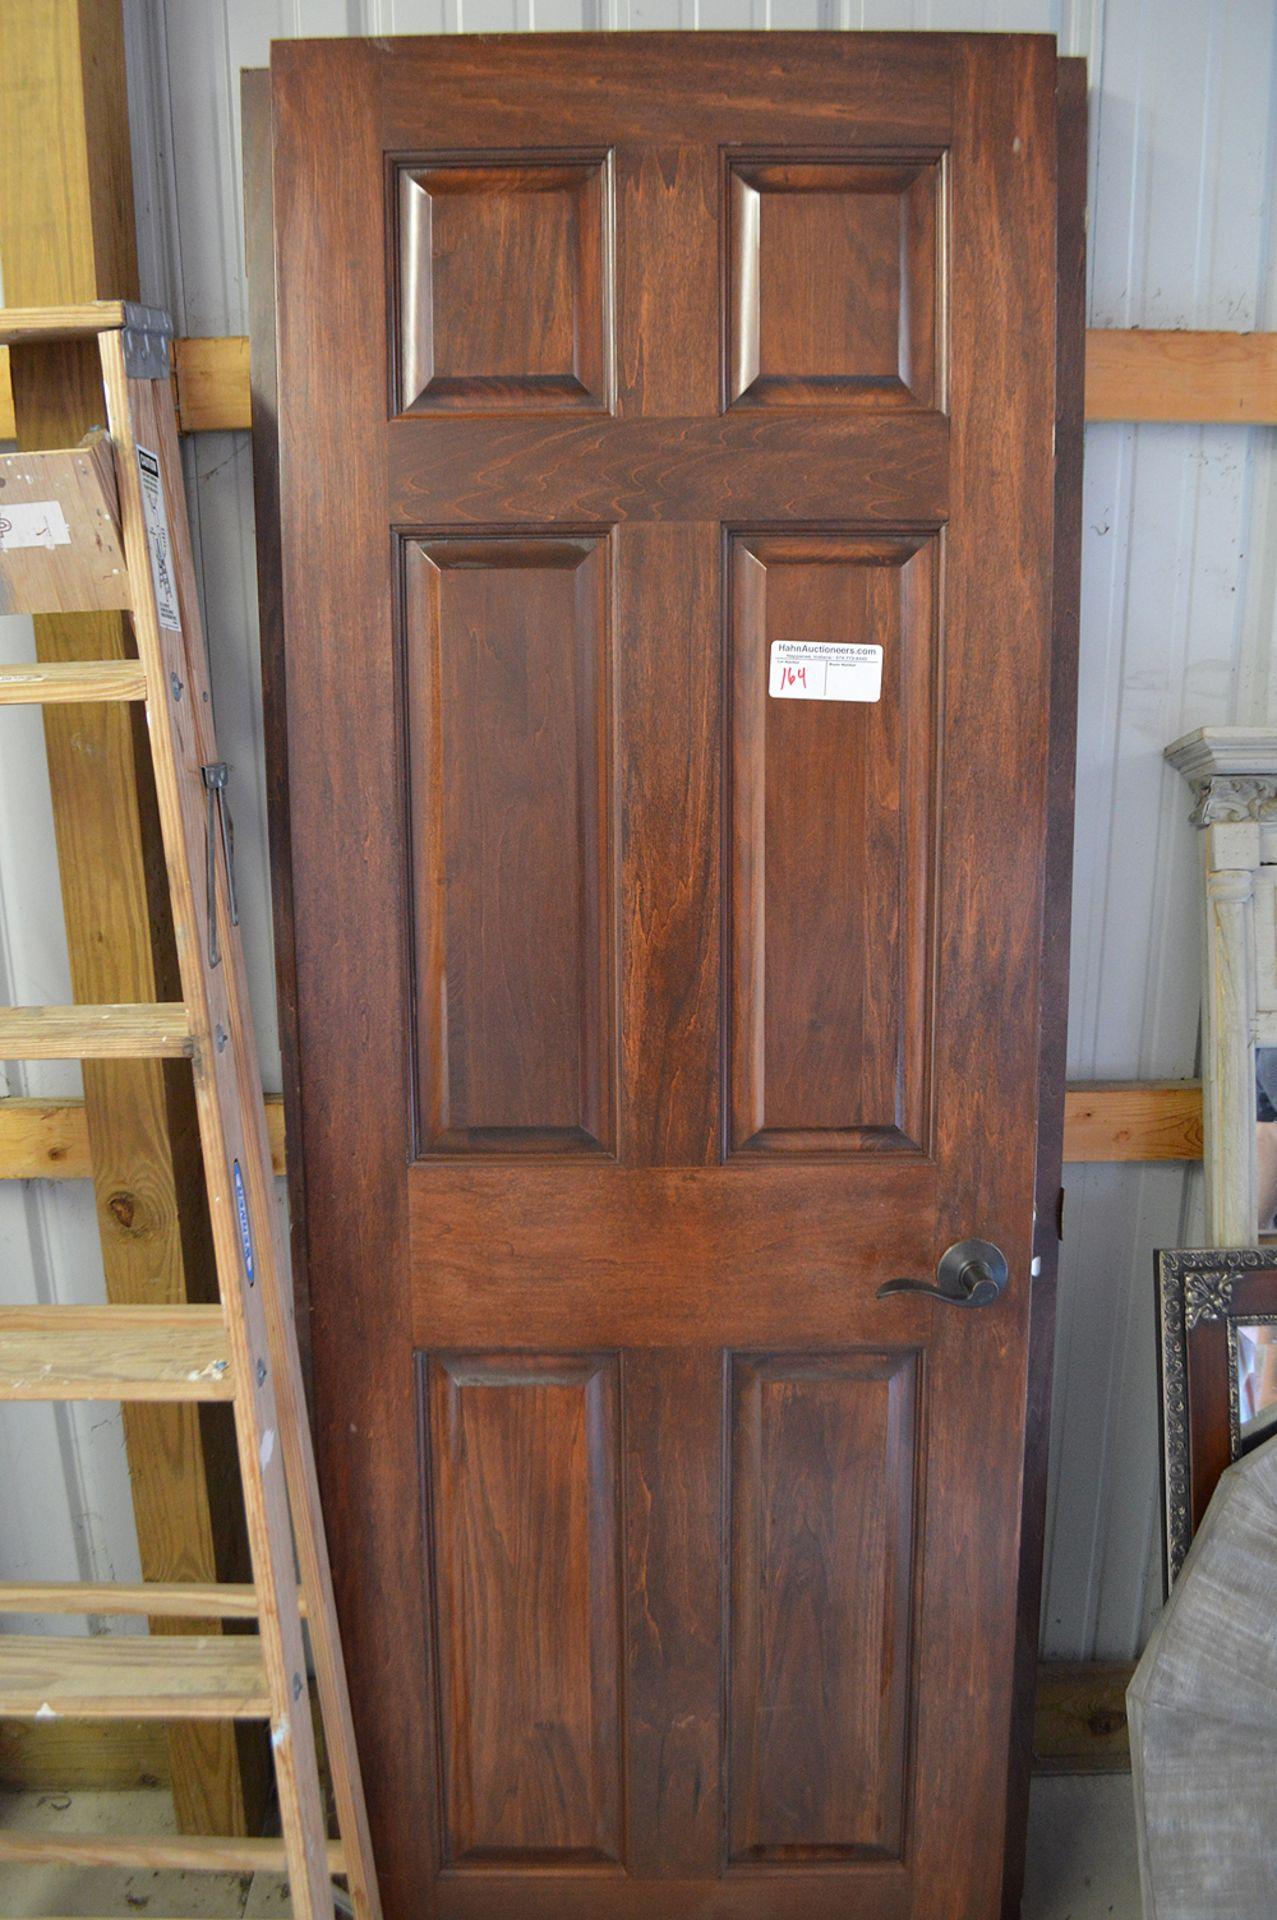 Lot 164 - (2) SOLID CORE INTERIOR DOORS